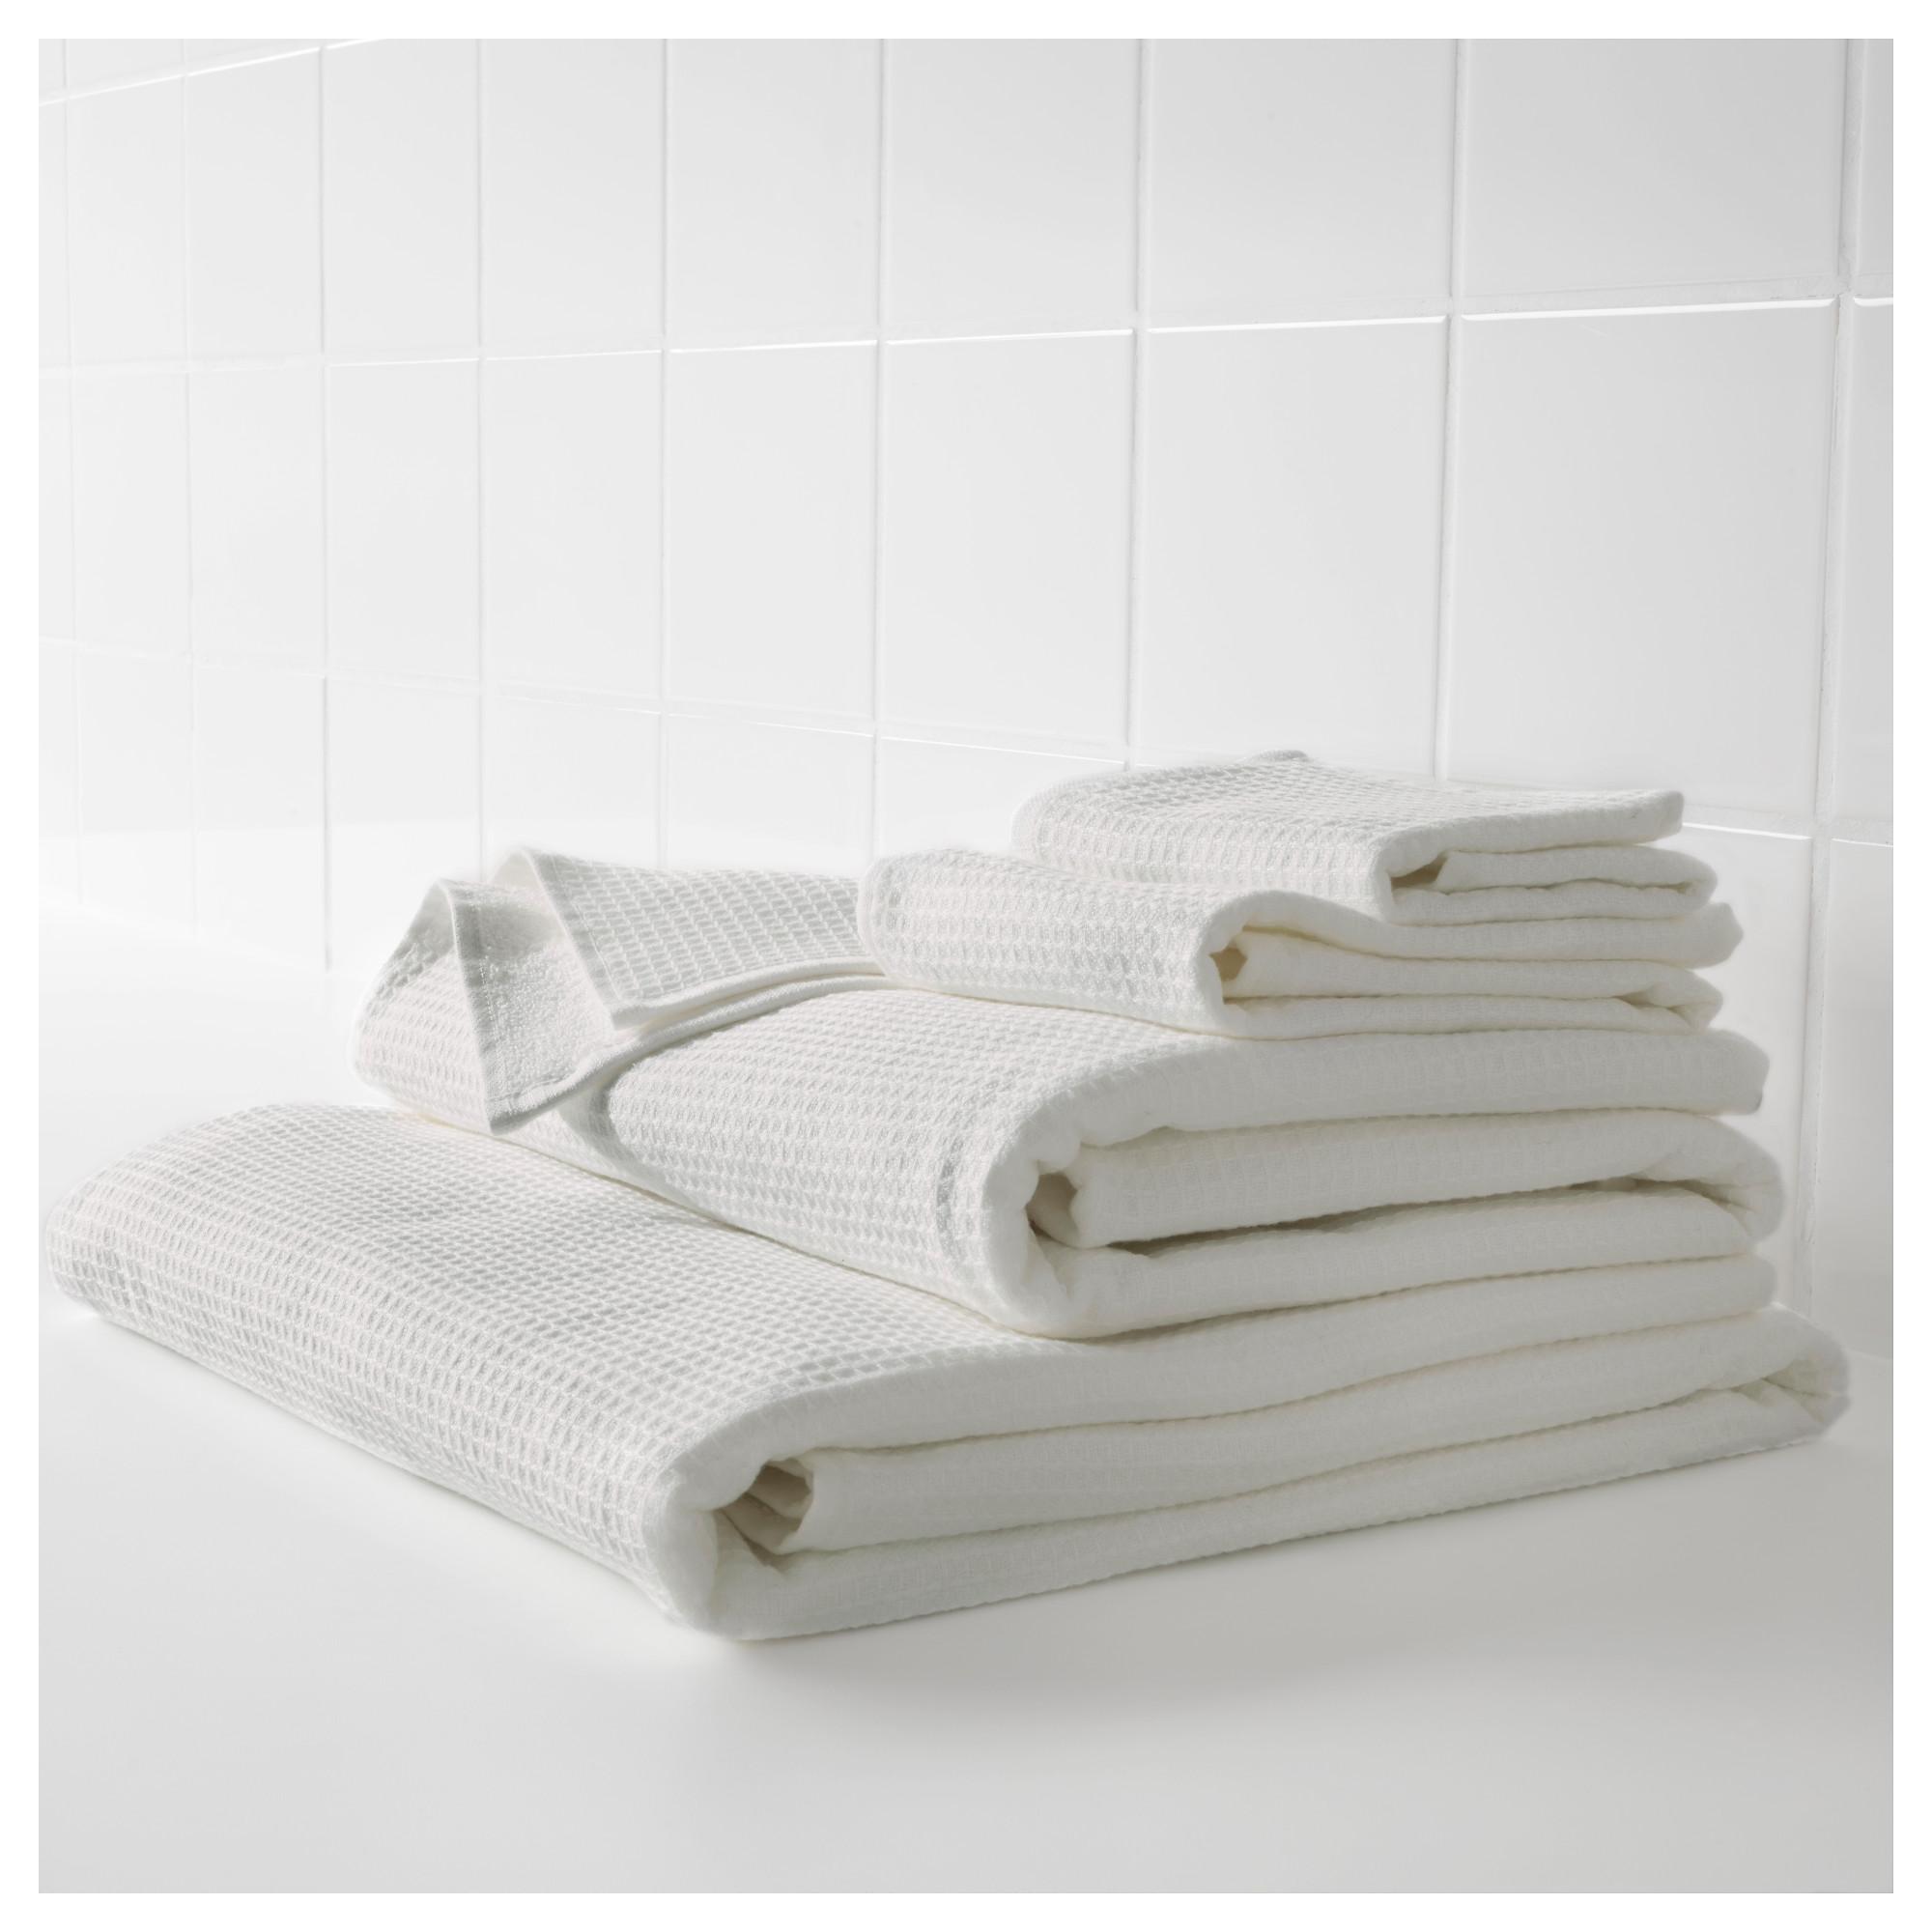 Ikea Salviken Bath Towel White Products Bath Sheets Ikea